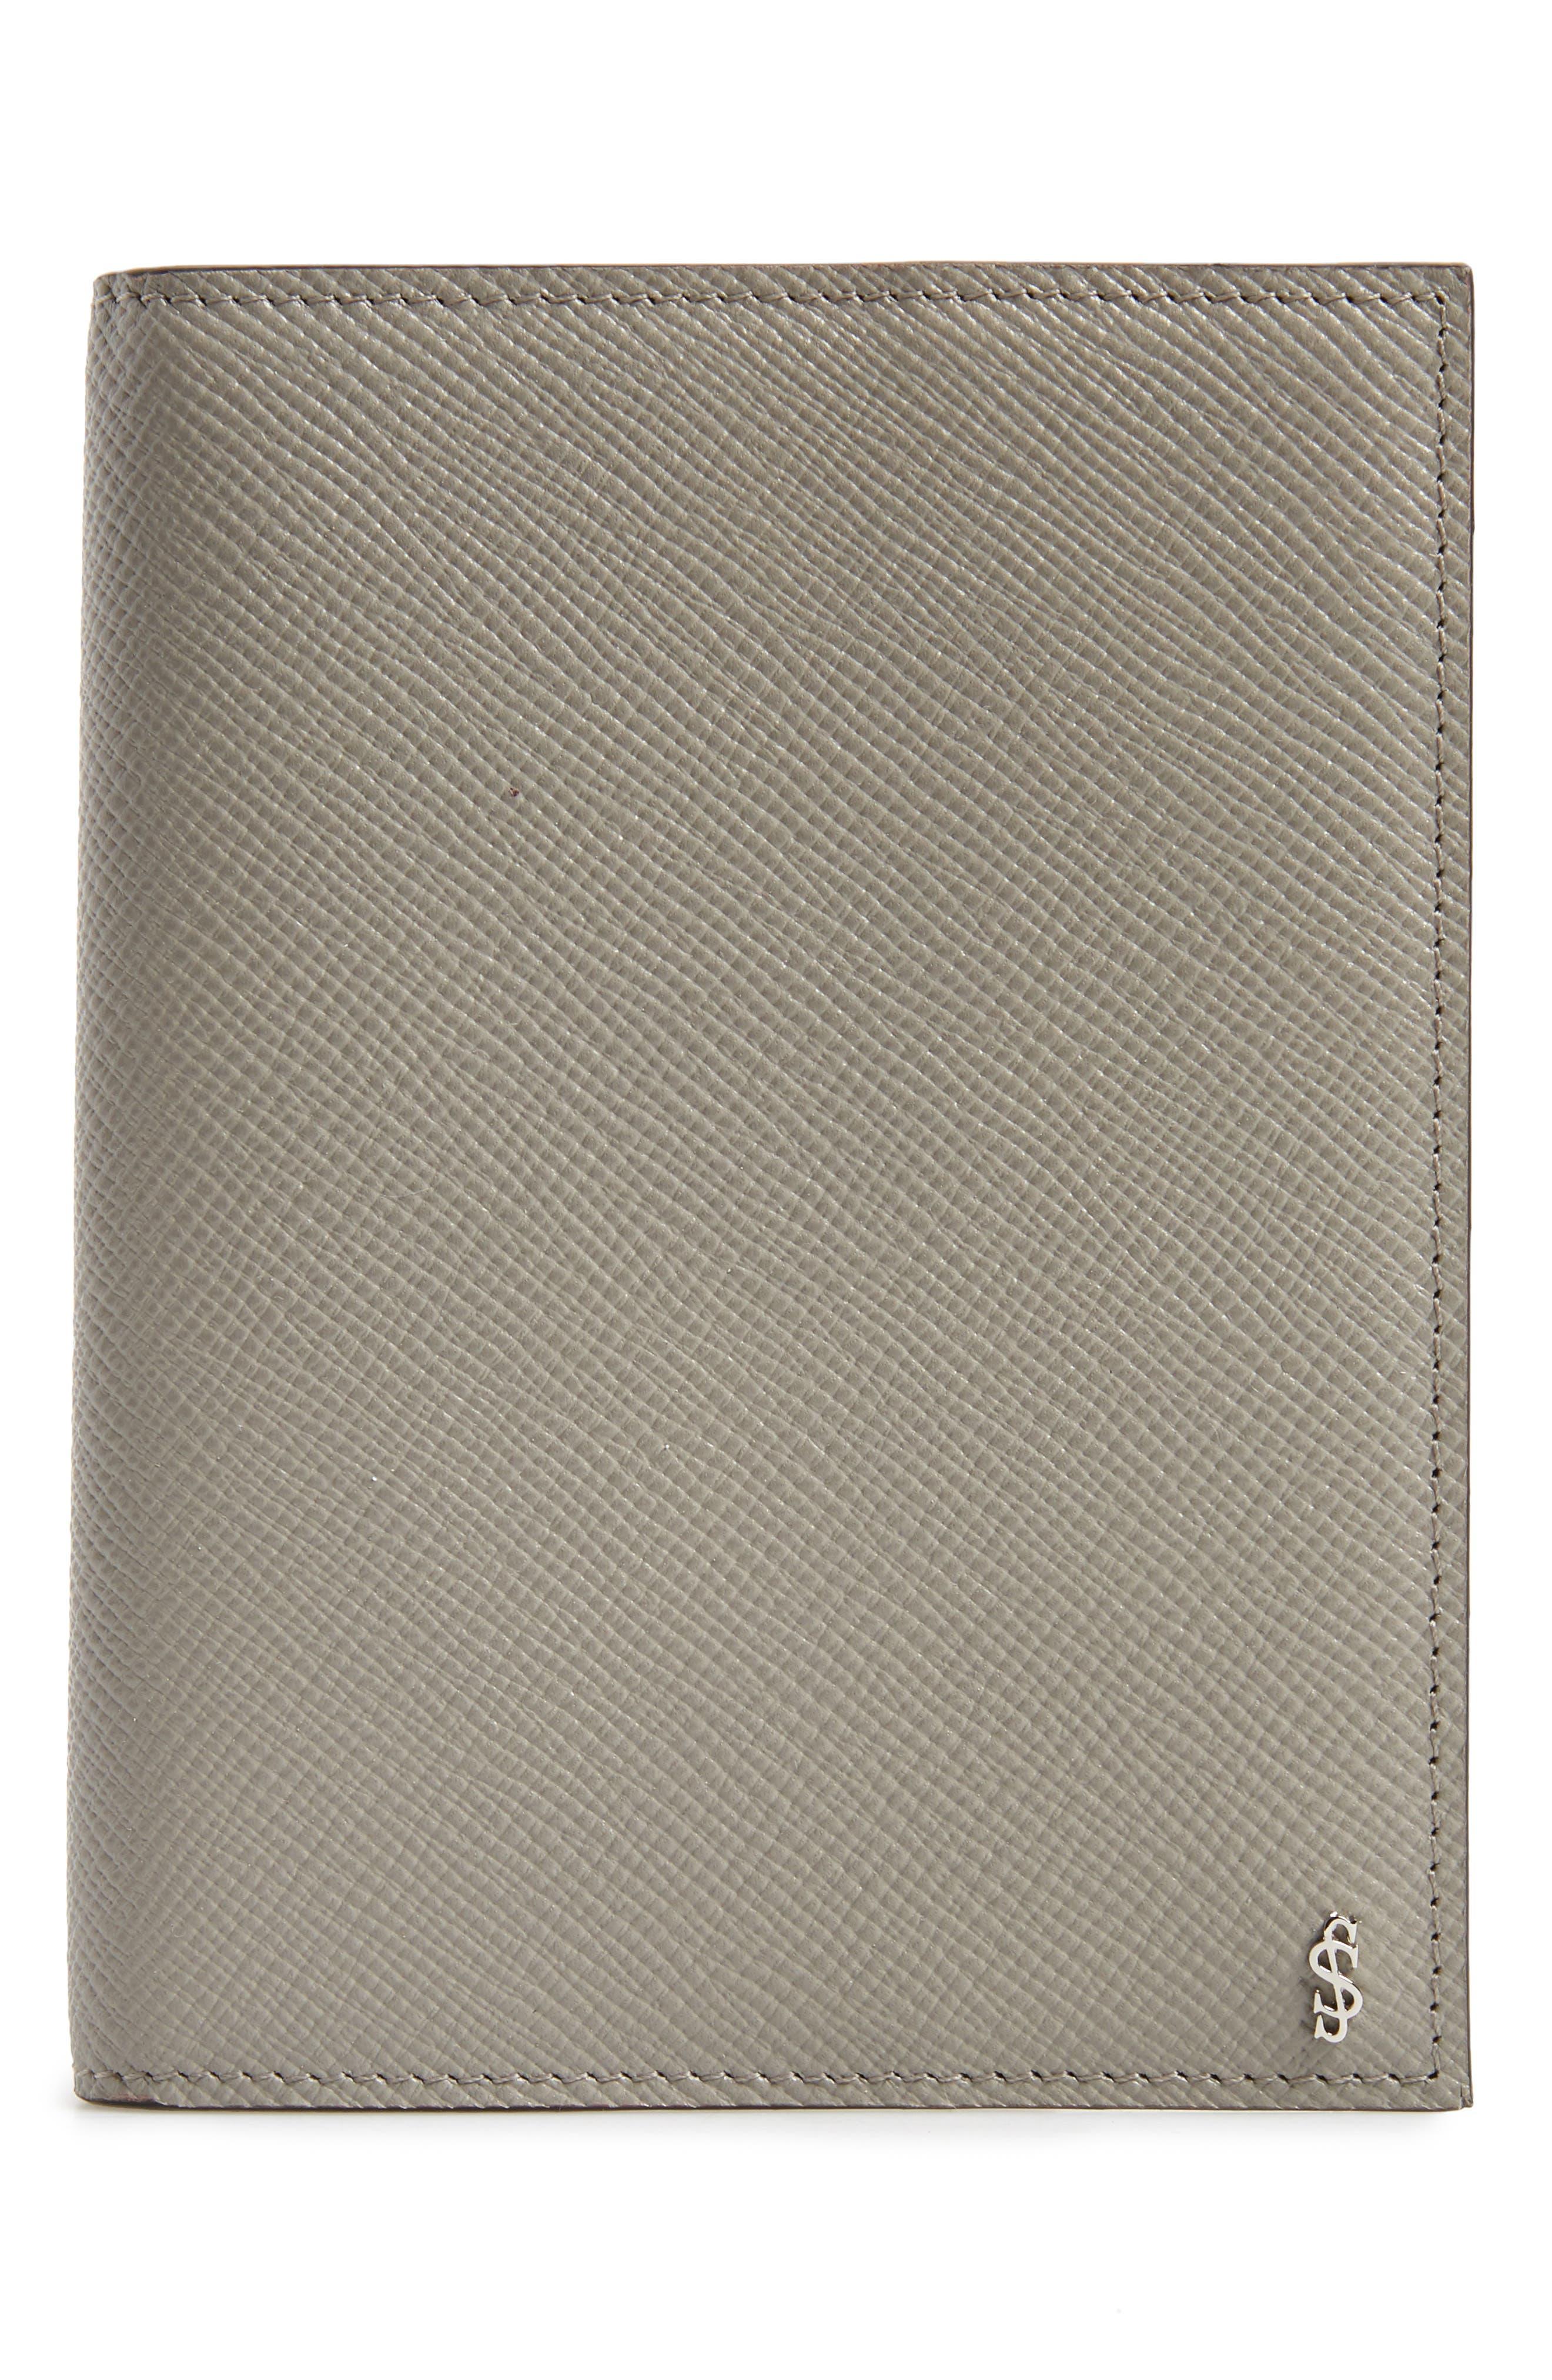 Evolution Leather Passport Case,                         Main,                         color, 020